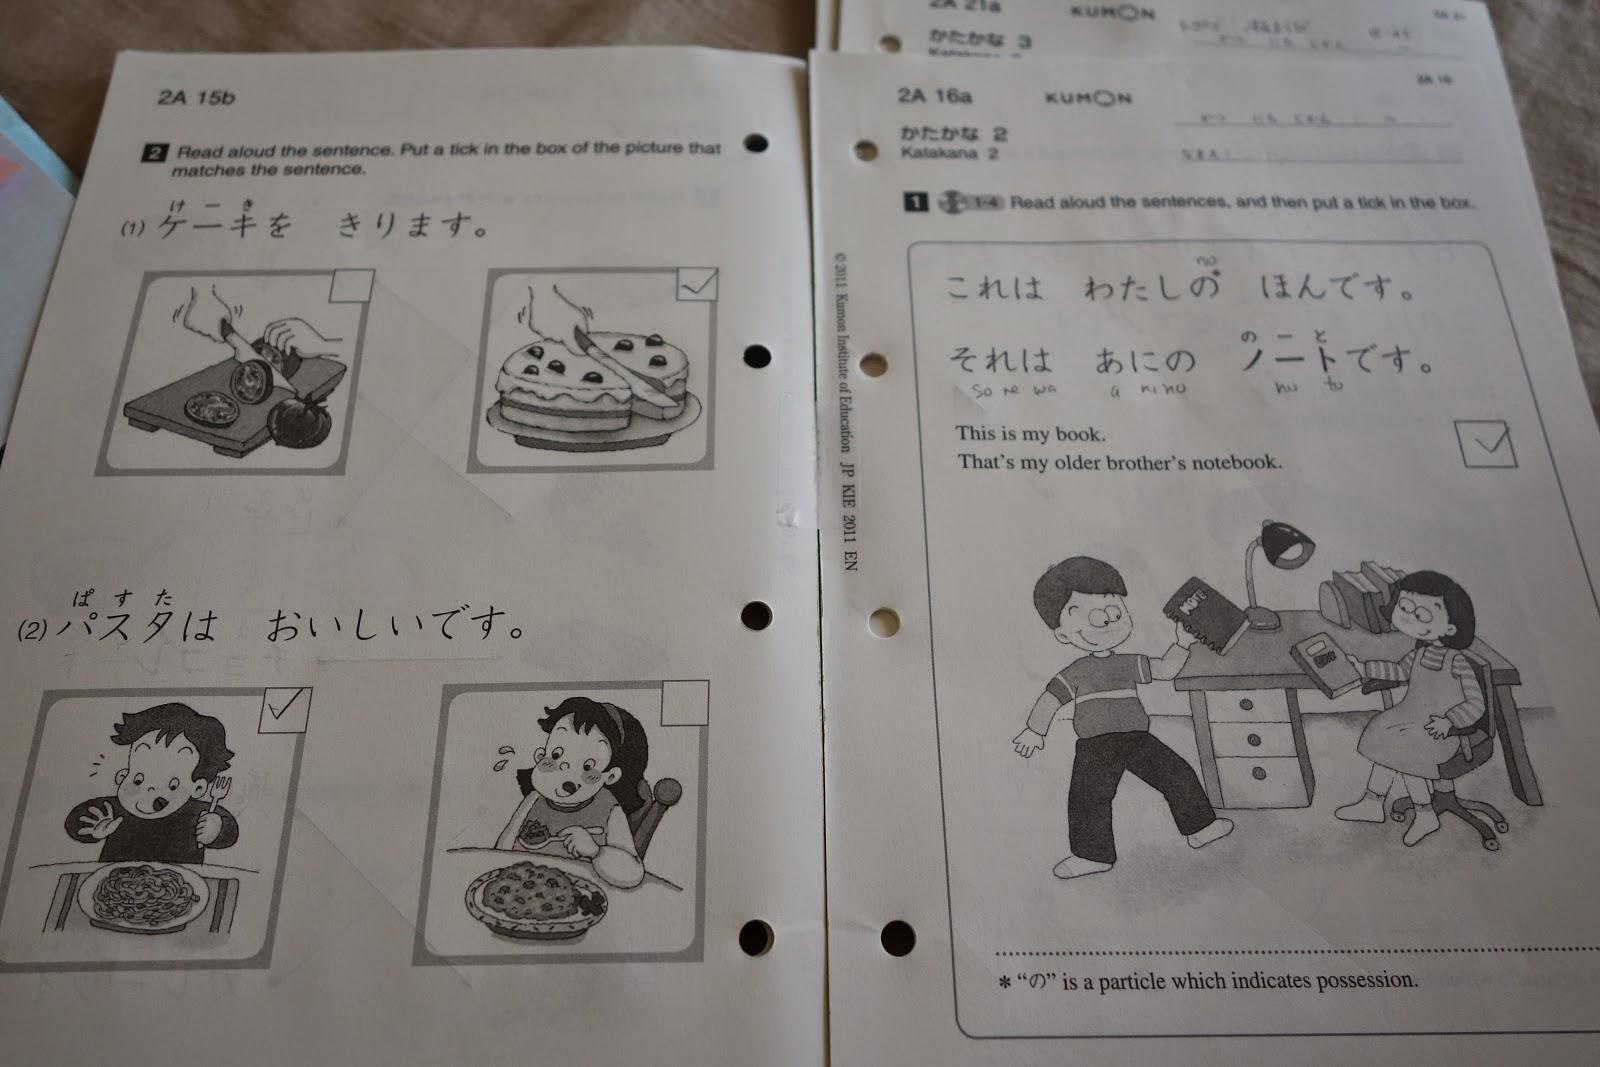 Nanyfadhly Kumon Correspondence Class 1st Review